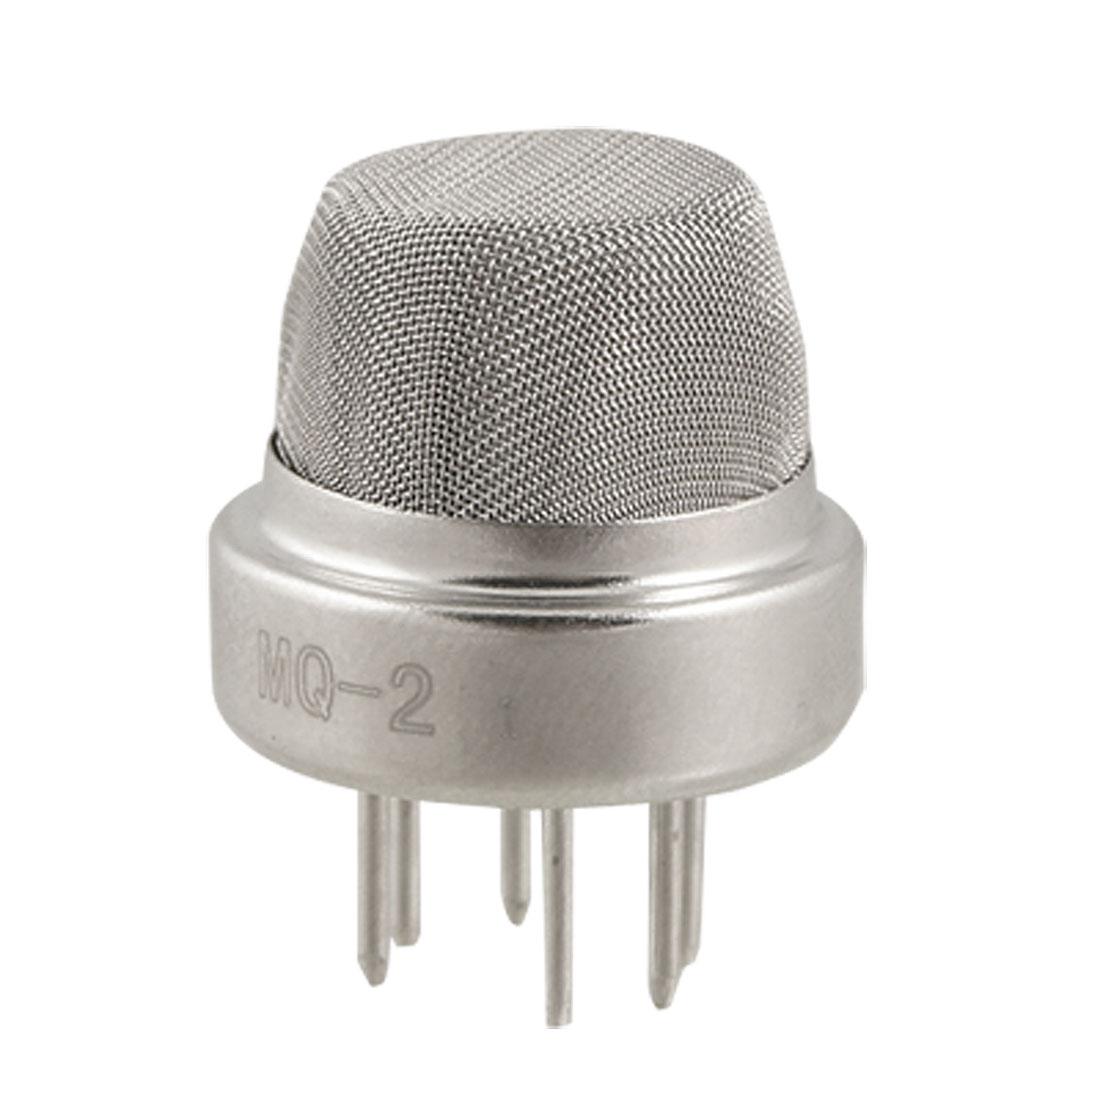 MQ-2 Smoke LPG i-butane Propane Methane Alcohol Hydrogen Petroleum Gas Sensor